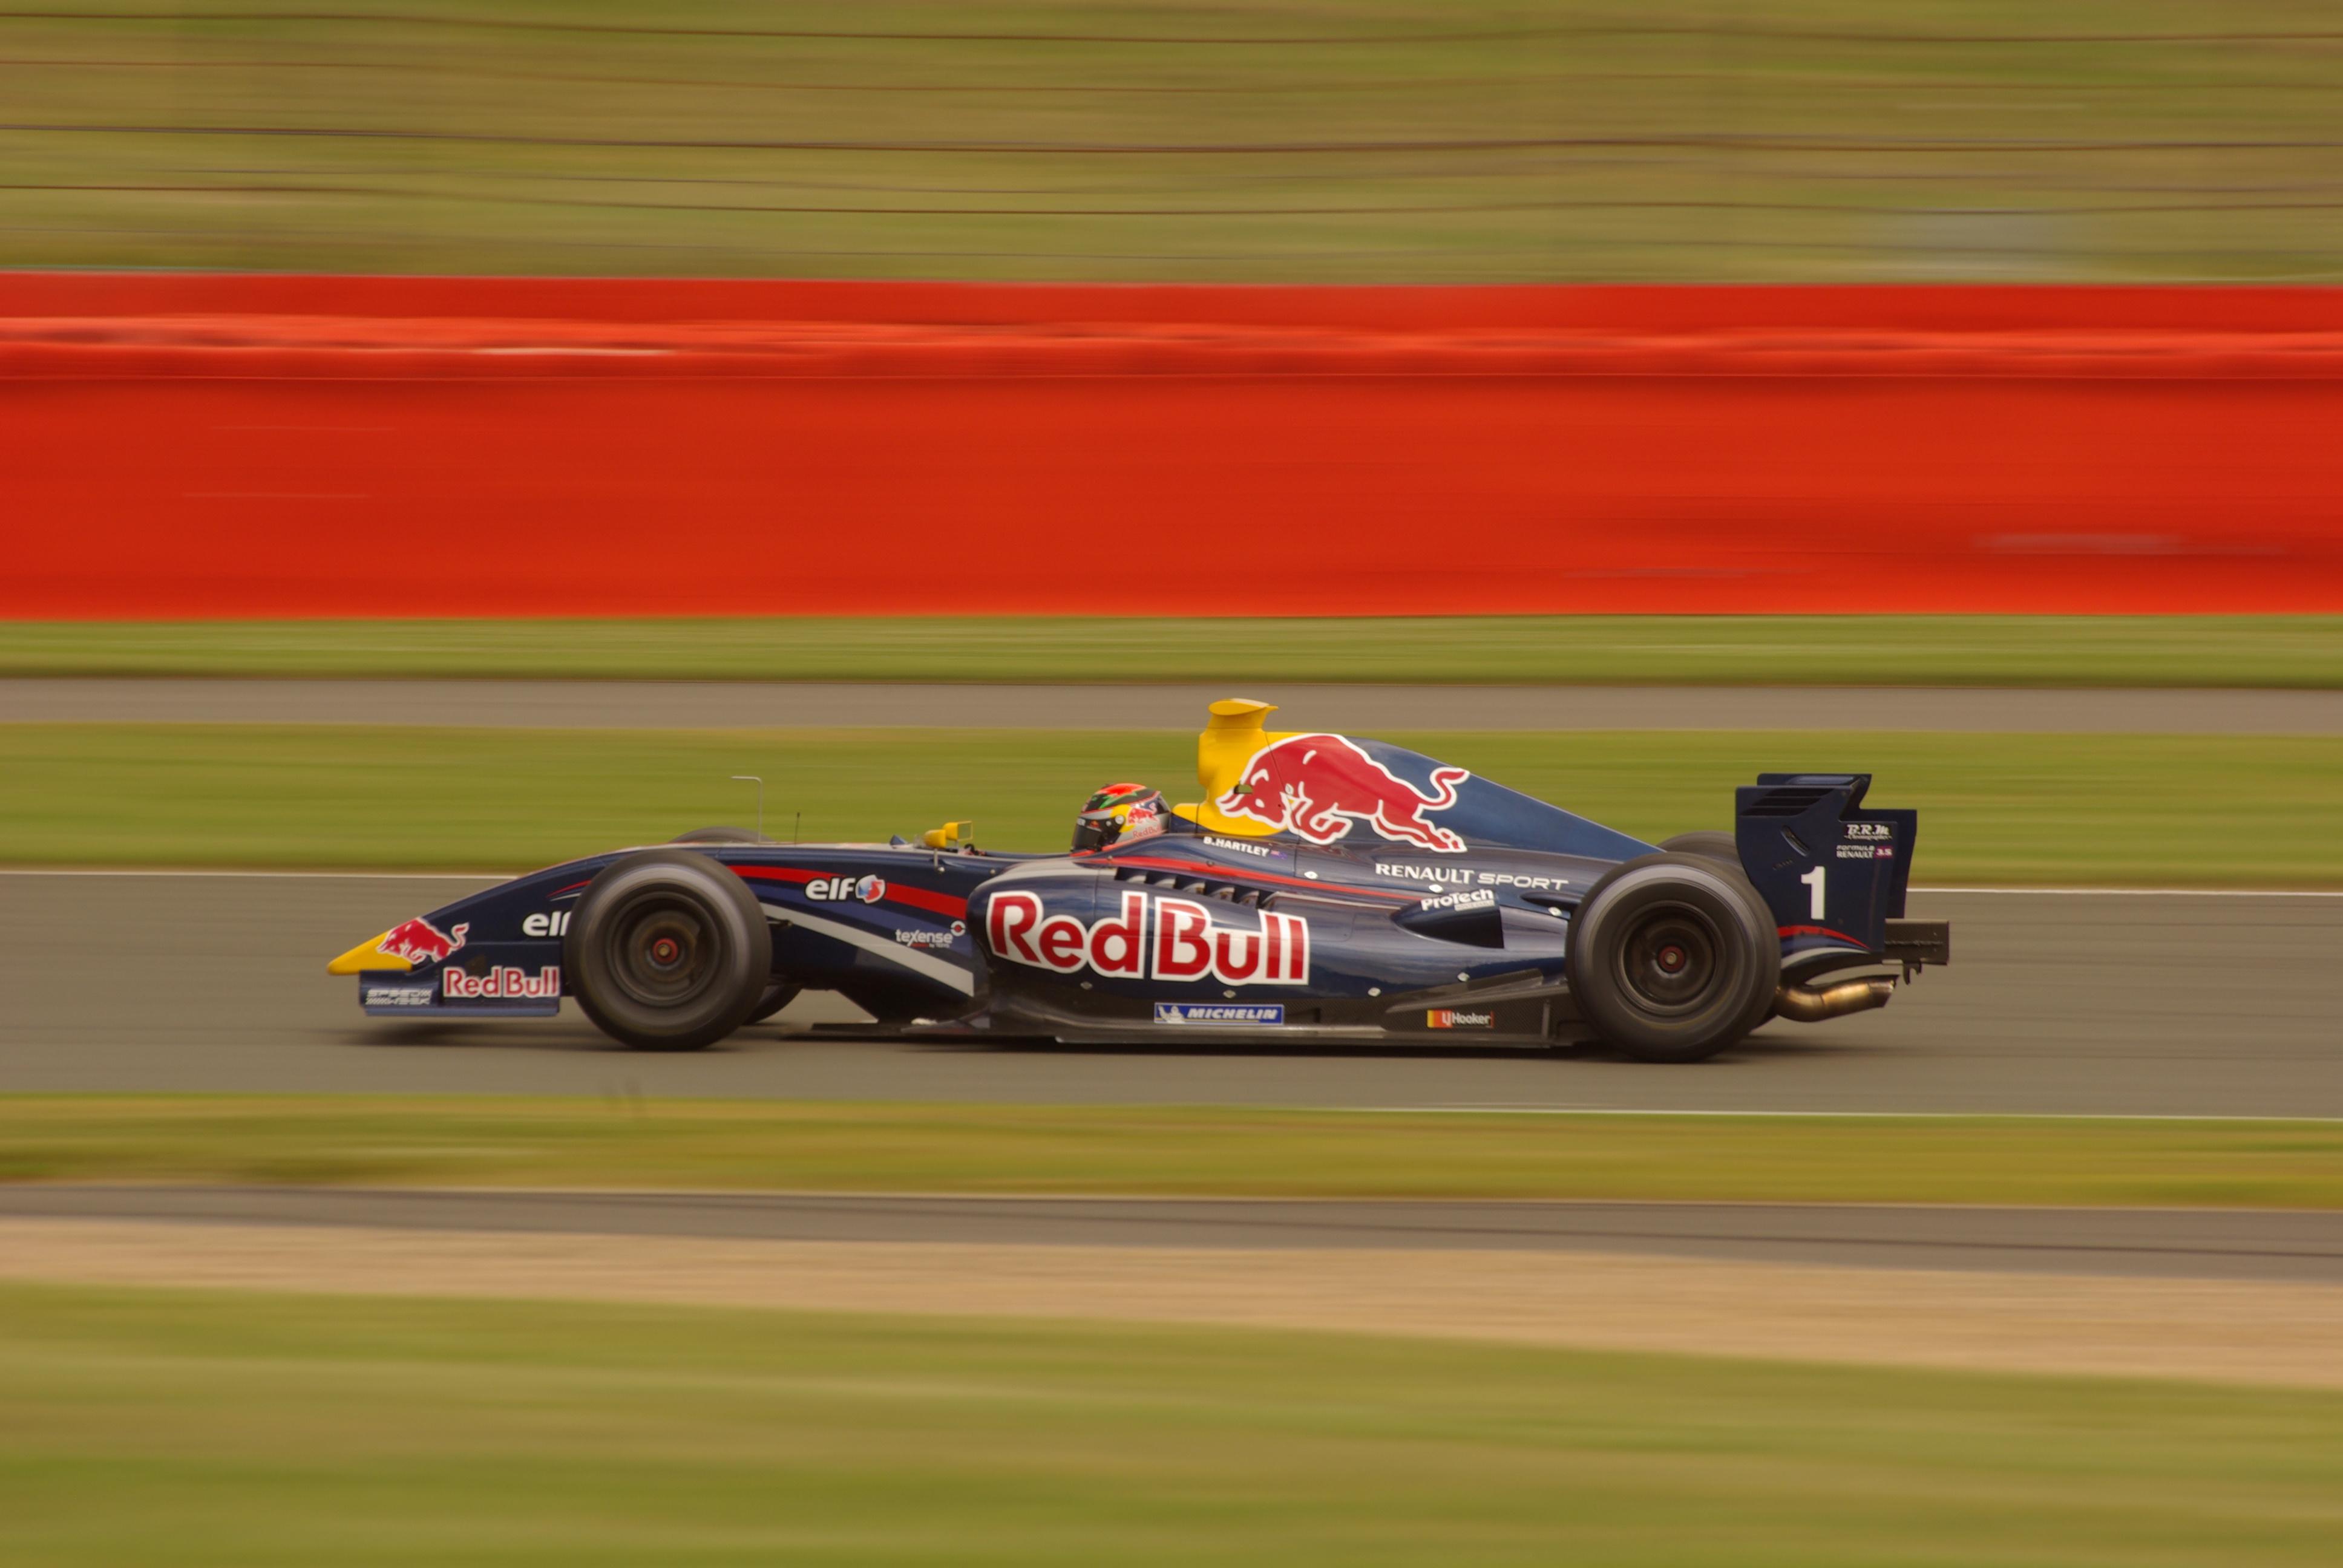 File:Brendon Hartley 2009 Formula Renault 3.5 Silverstone.jpg